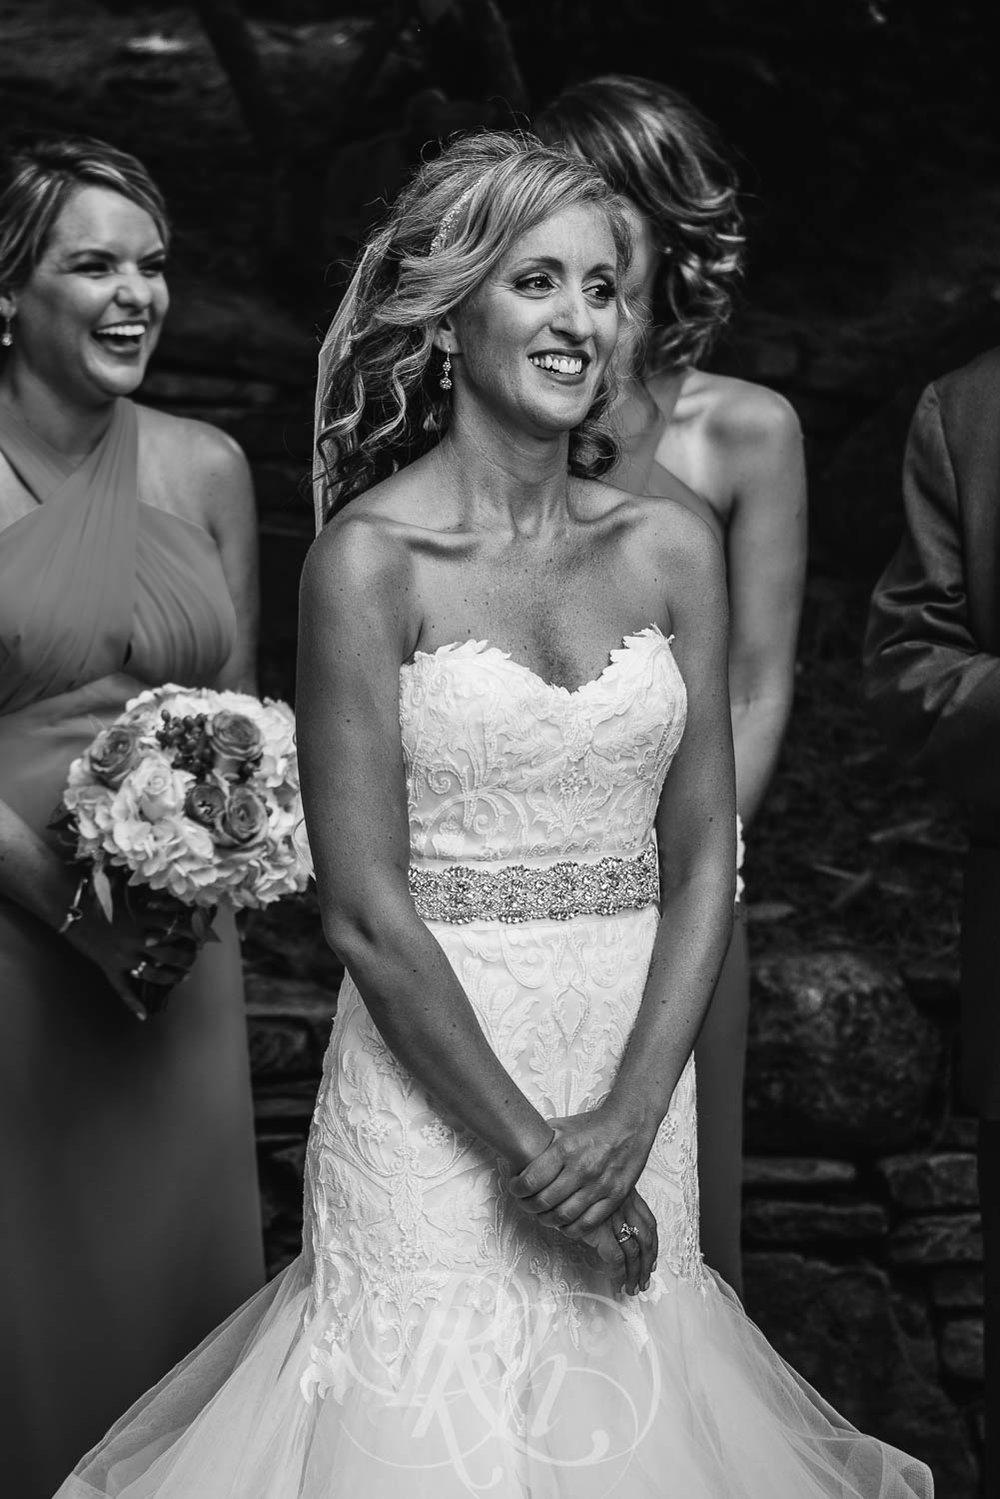 Megan & Jeff - Minnesota Wedding Photographer - Van Dusen Mansion - RKH Images - Blog  (15 of 37).jpg